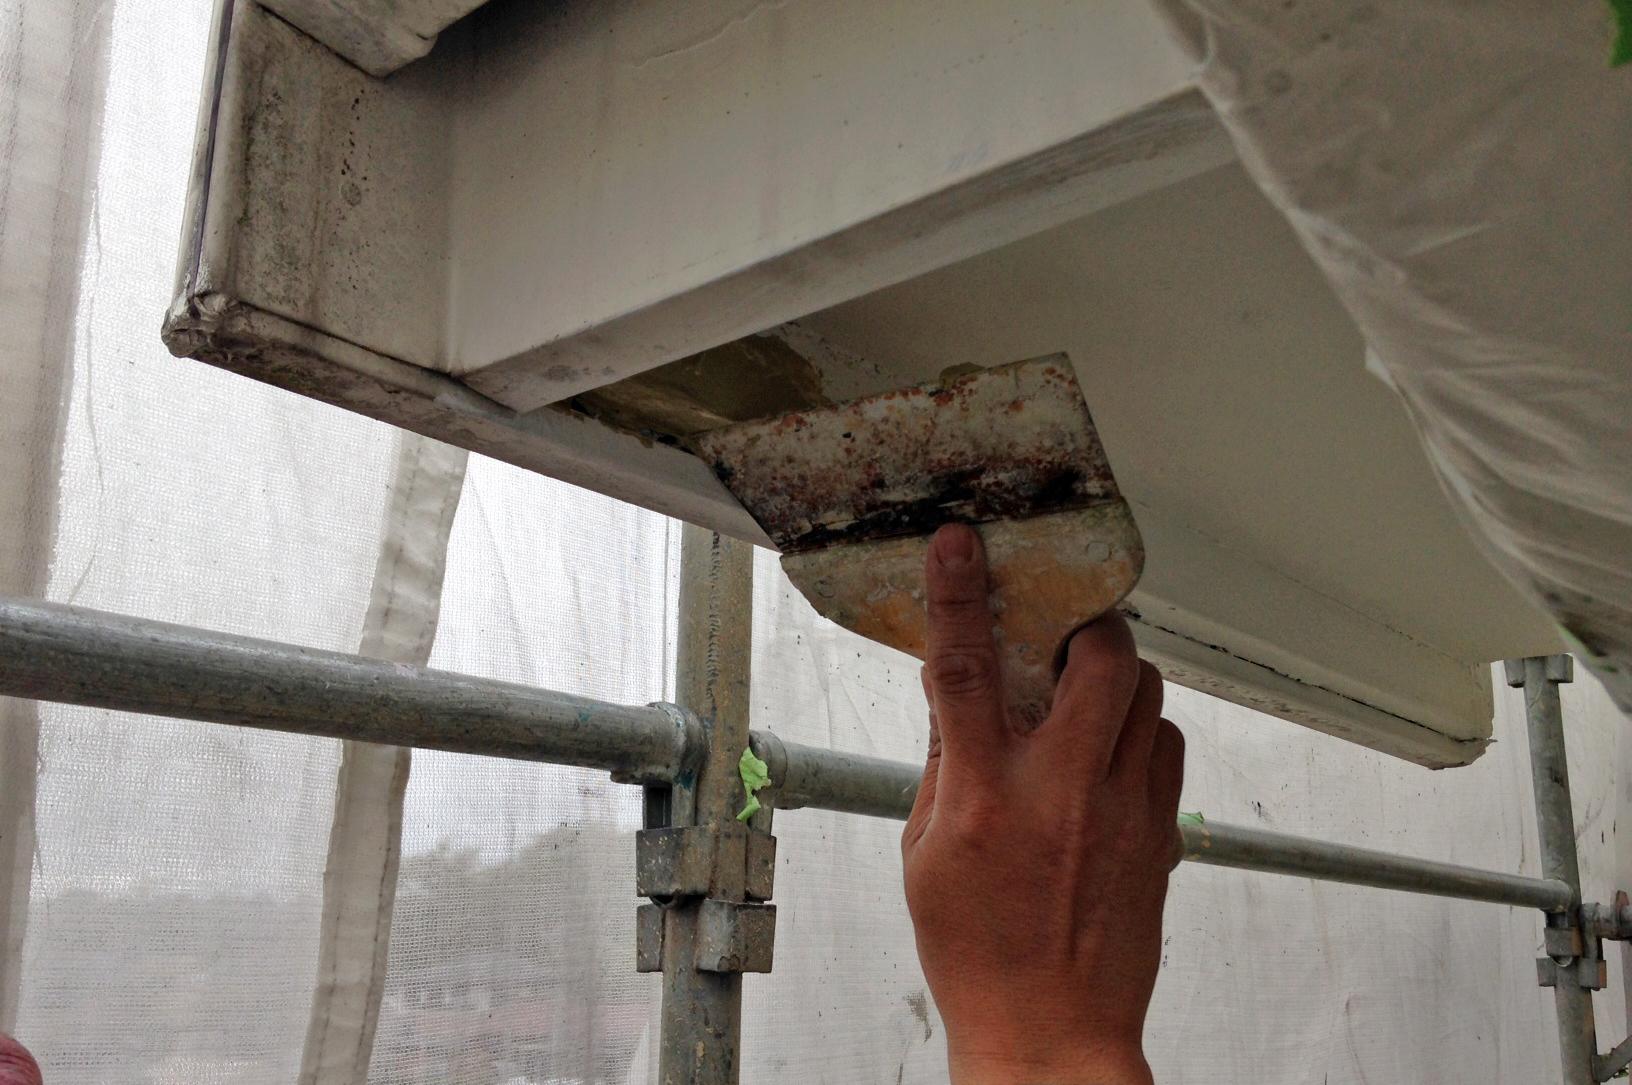 高遮熱屋根塗装、モルタル外壁塗装